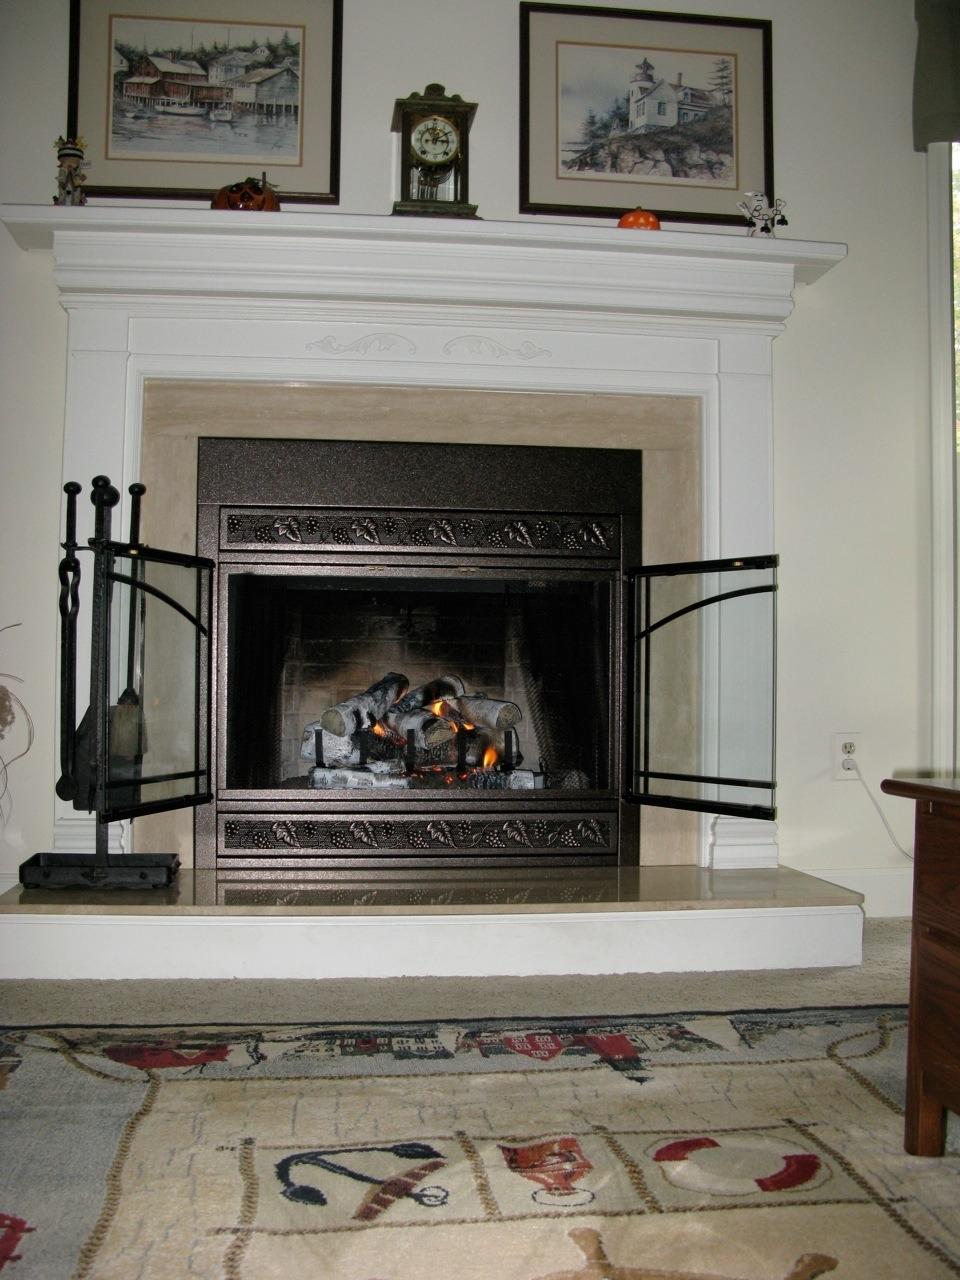 Brubaker Plumbing Heating & Air Conditioning image 1